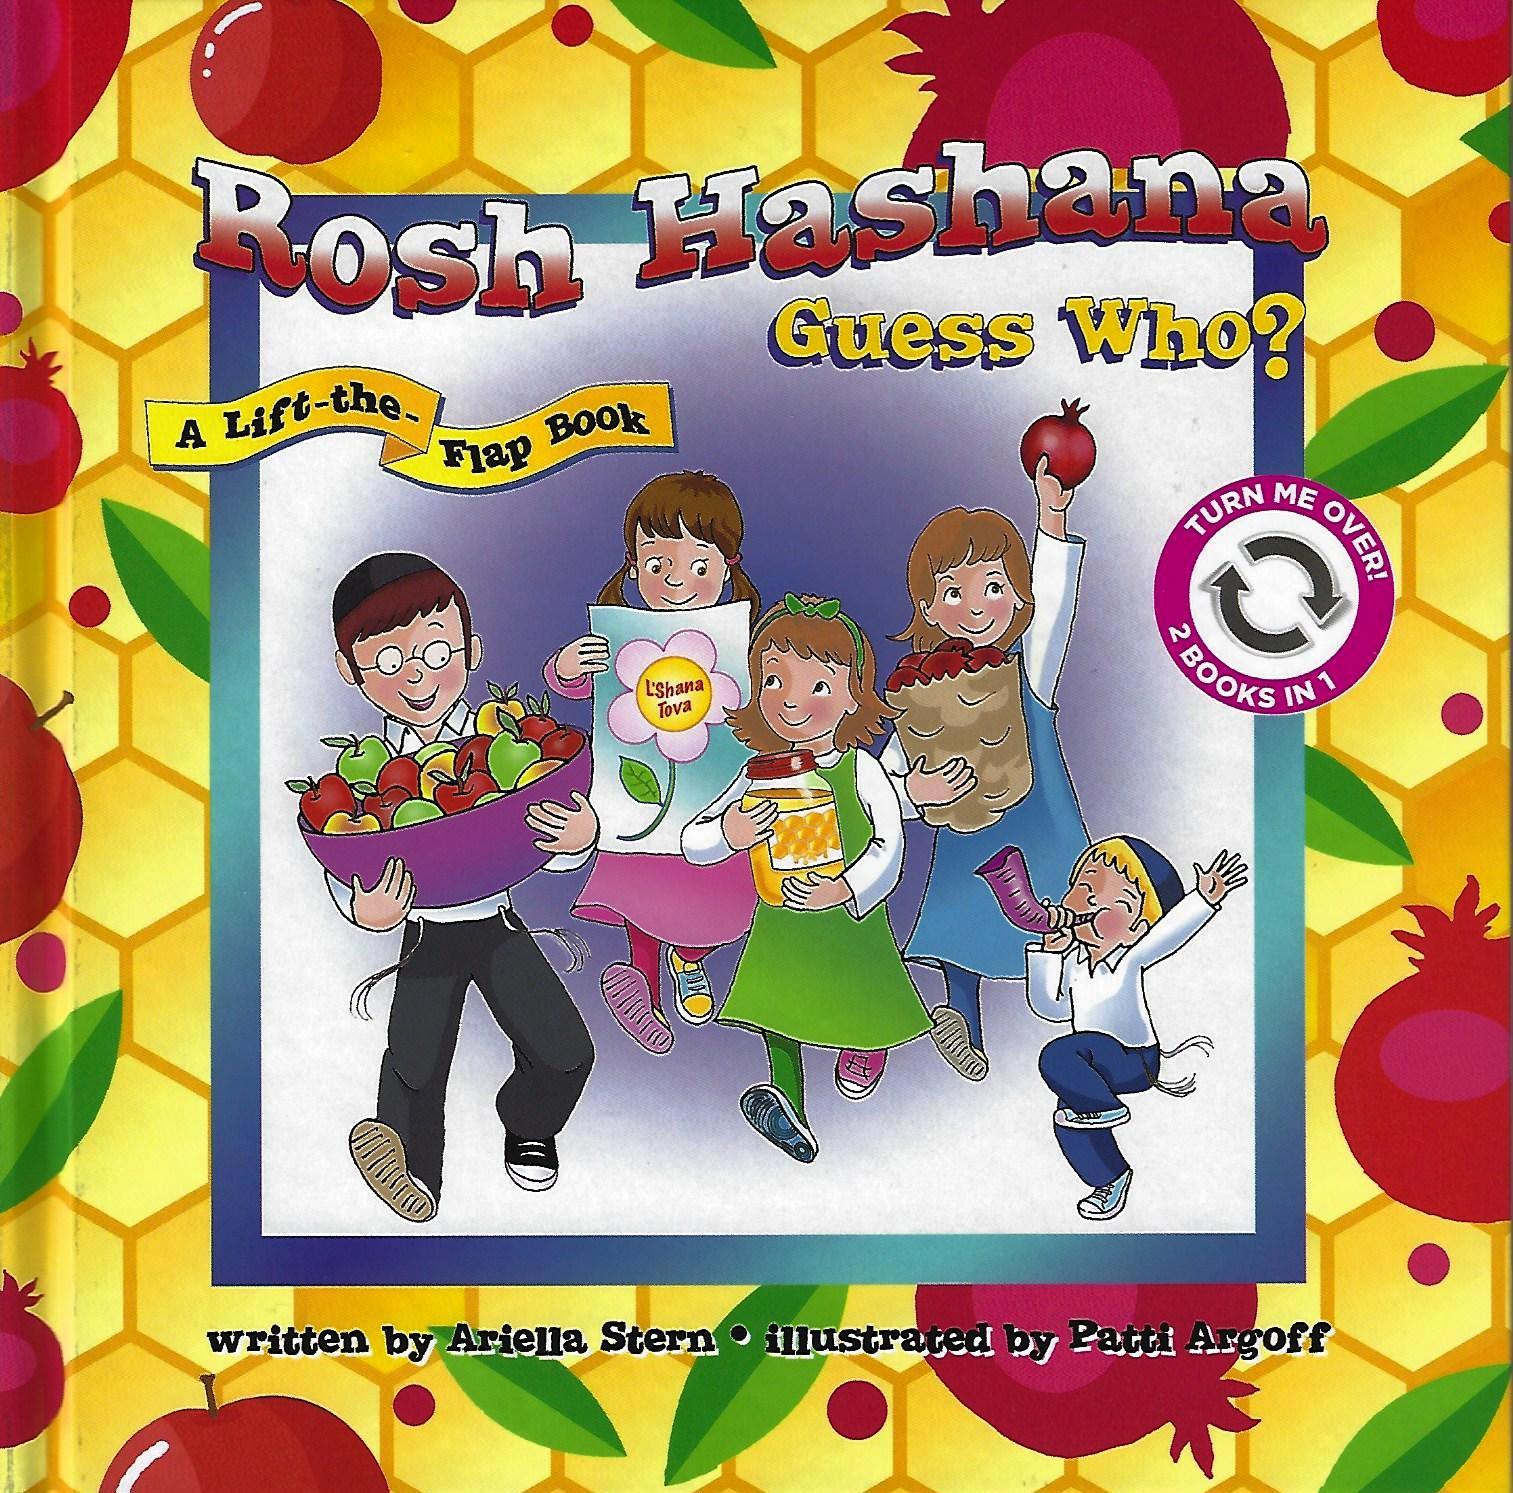 Rosh Hashana, Yom Kippur Guess Who? A Lift-the-Flap Book